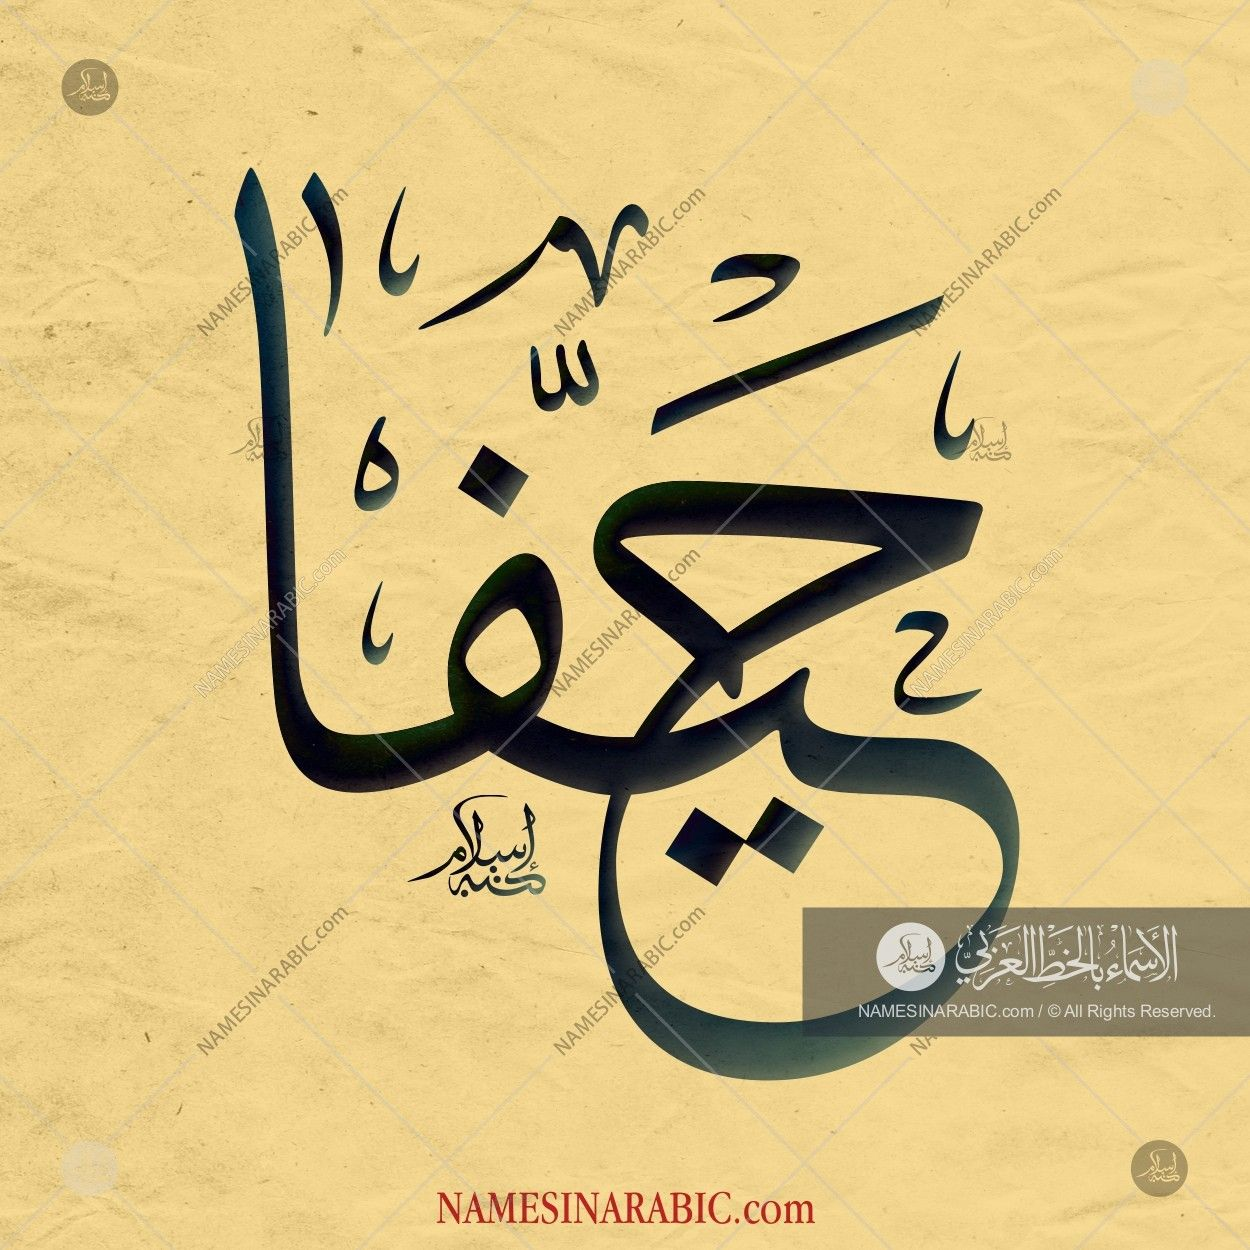 Haifa Name In Arabic Calligraphy Calligraphy Haifa Arabic